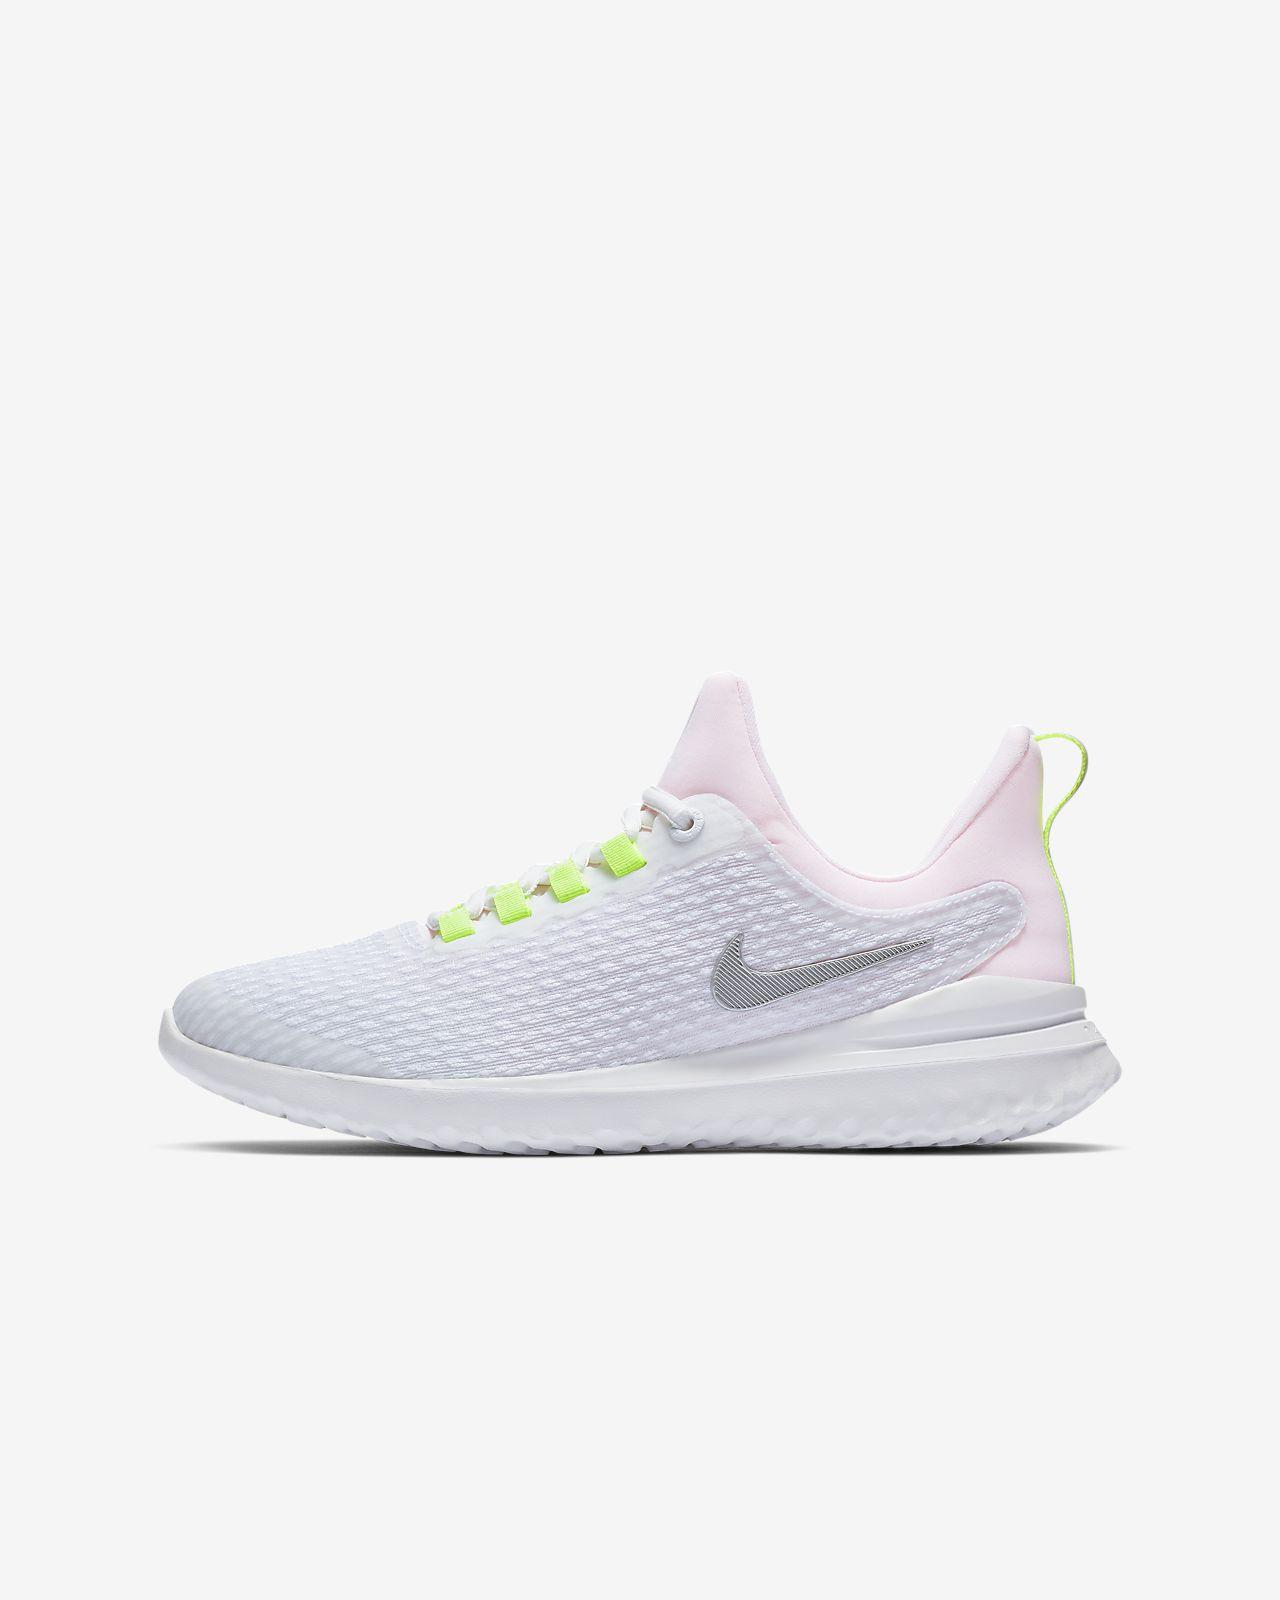 368f15c9c19 Nike Renew Rival Older Kids  Running Shoe. Nike.com GB